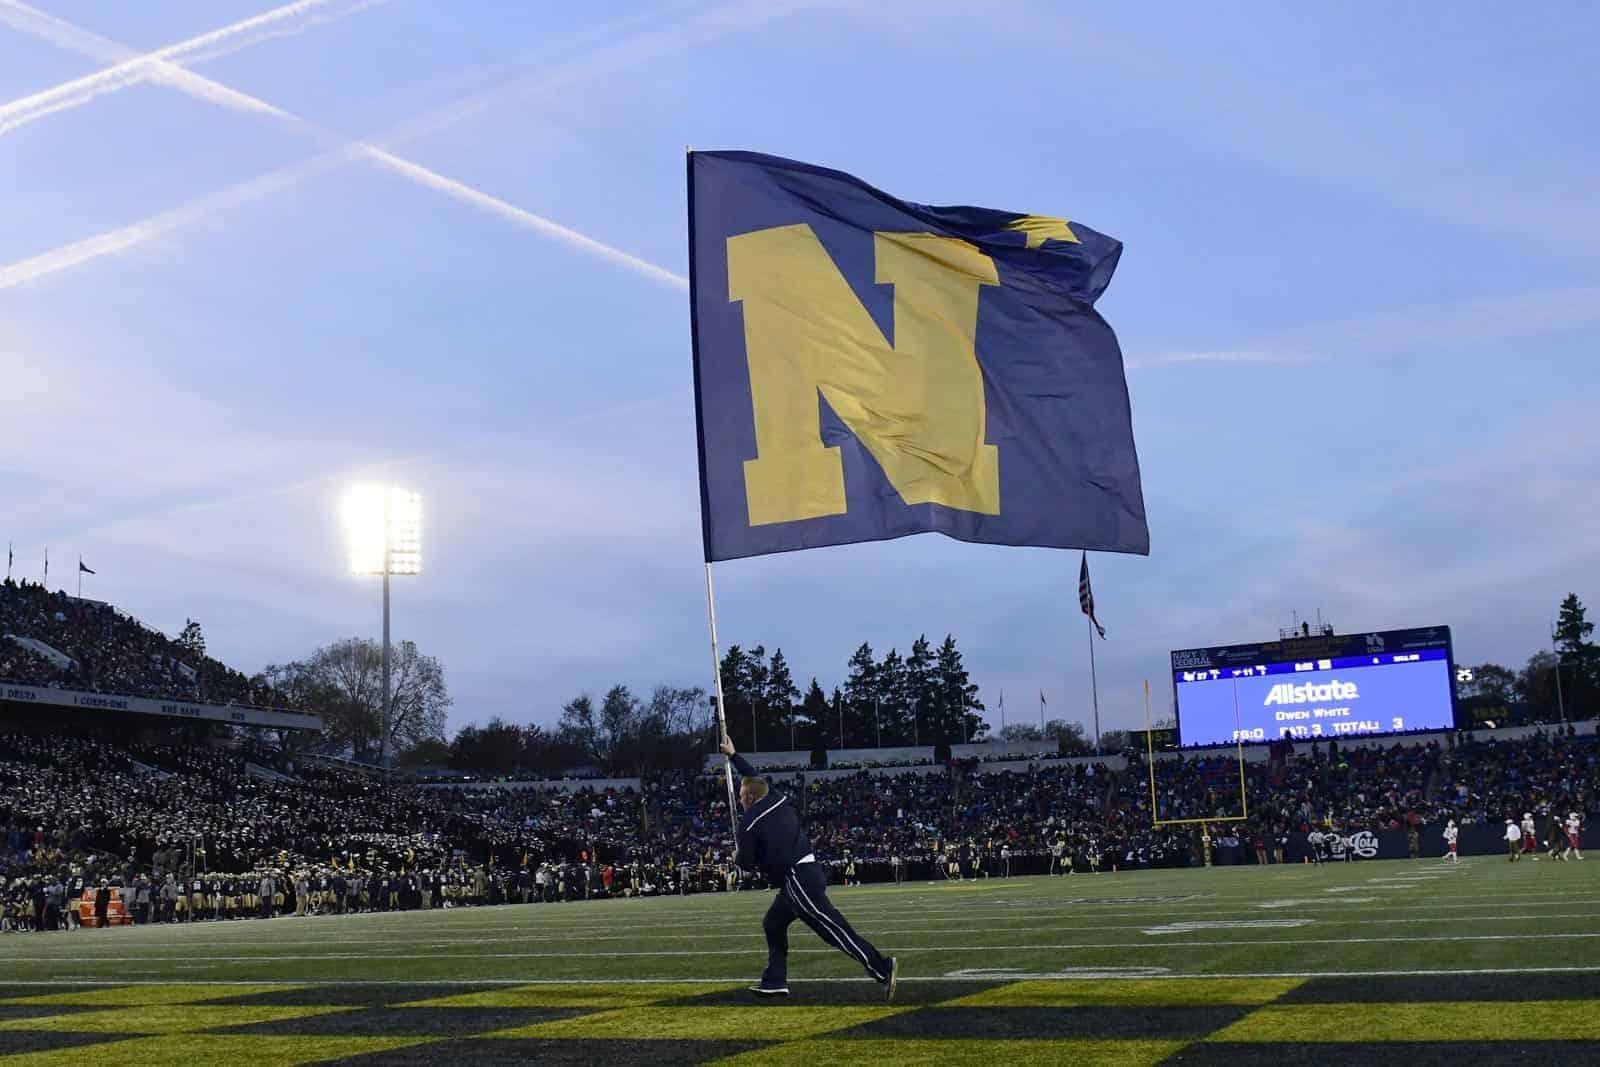 College Football Schedule: Navy